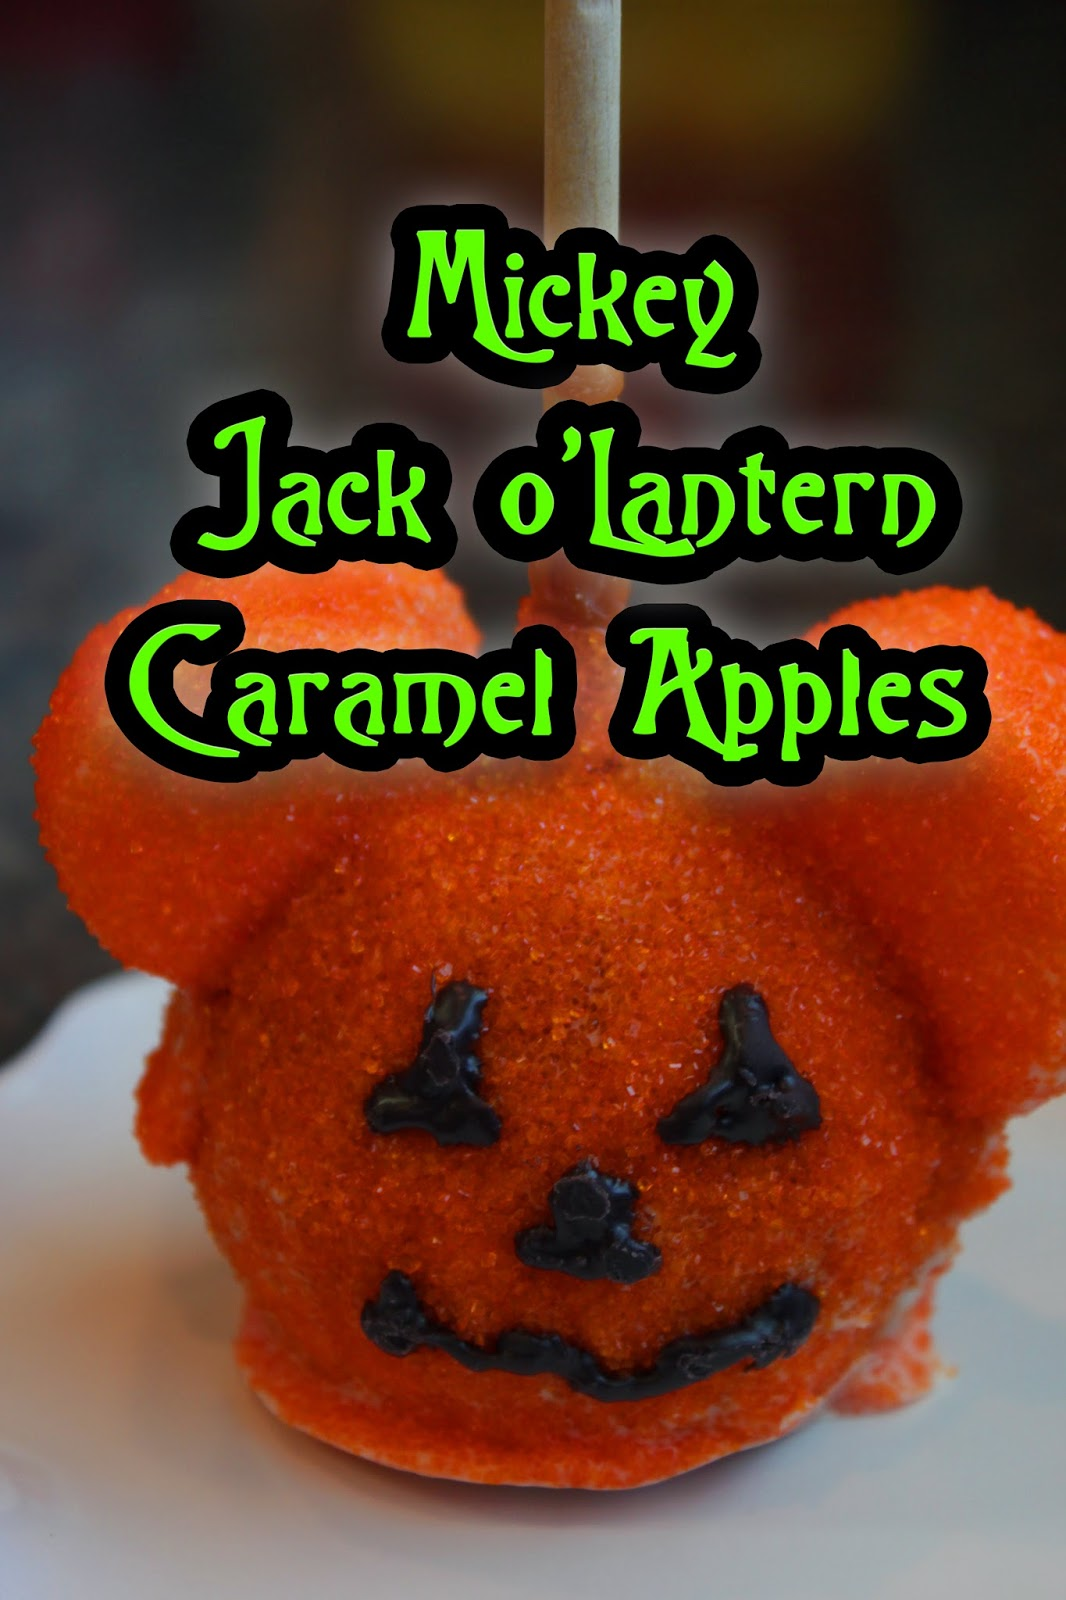 Mickey Jack OLantern Caramel Apples Recipe